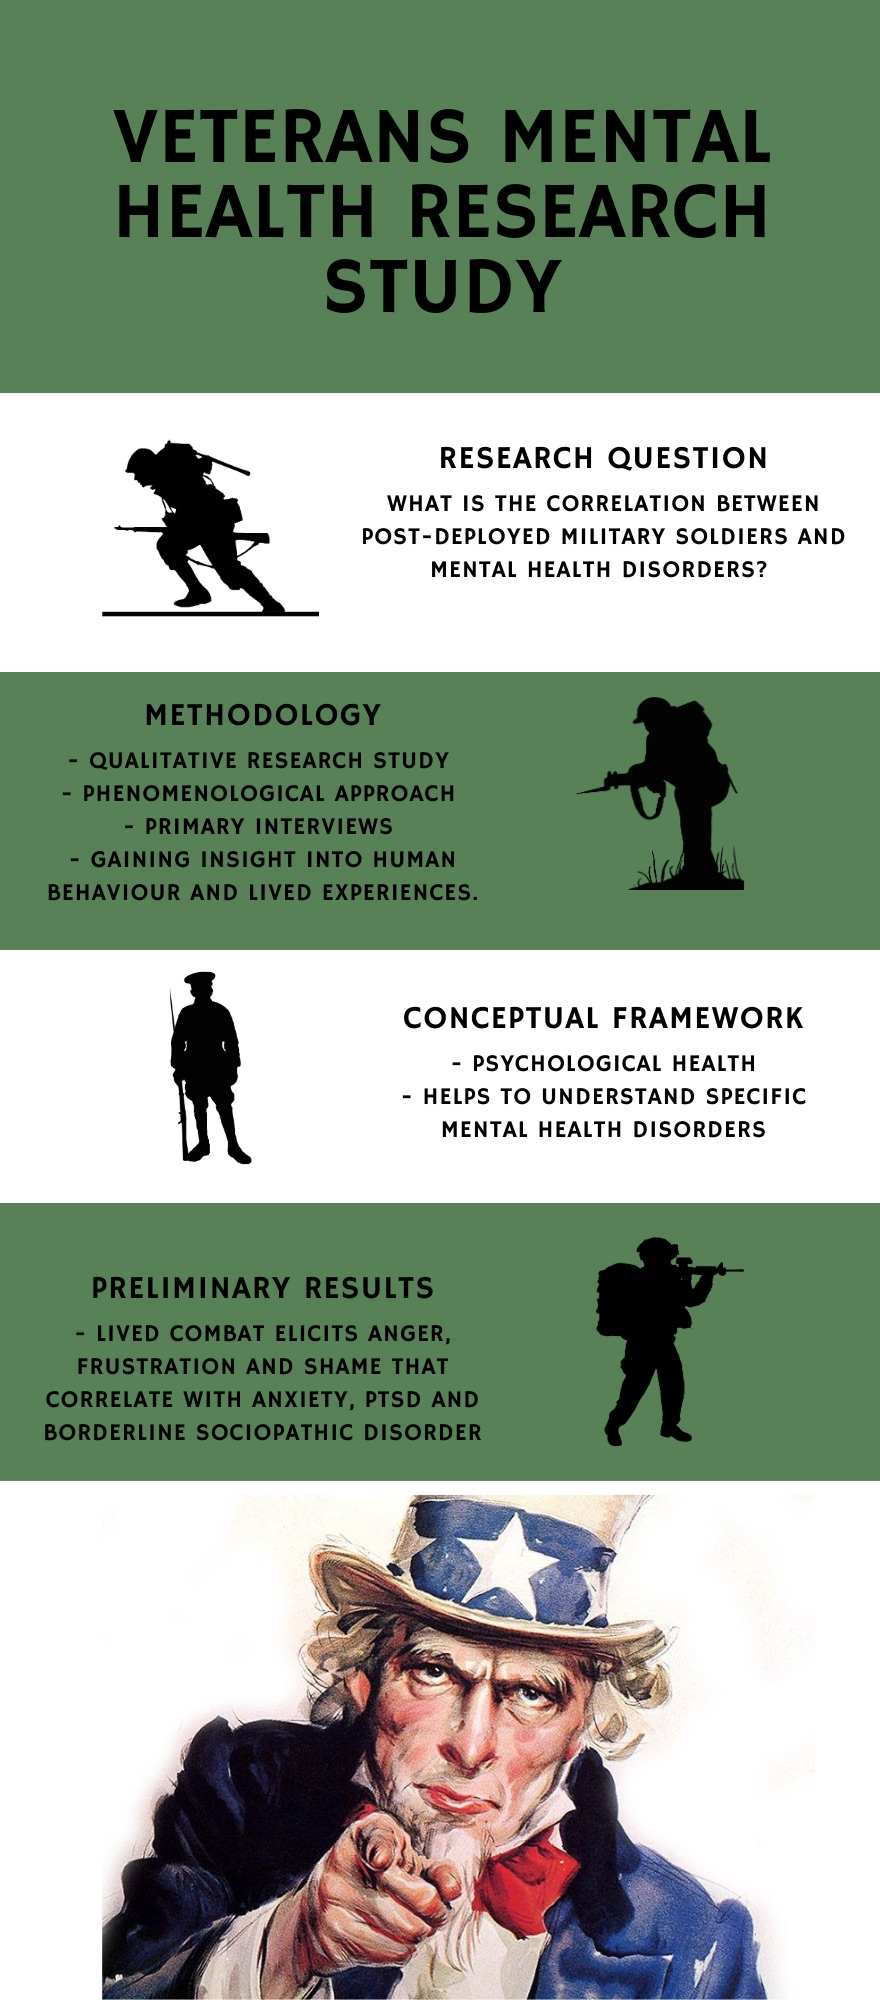 Veterans' Mental Health Research Study